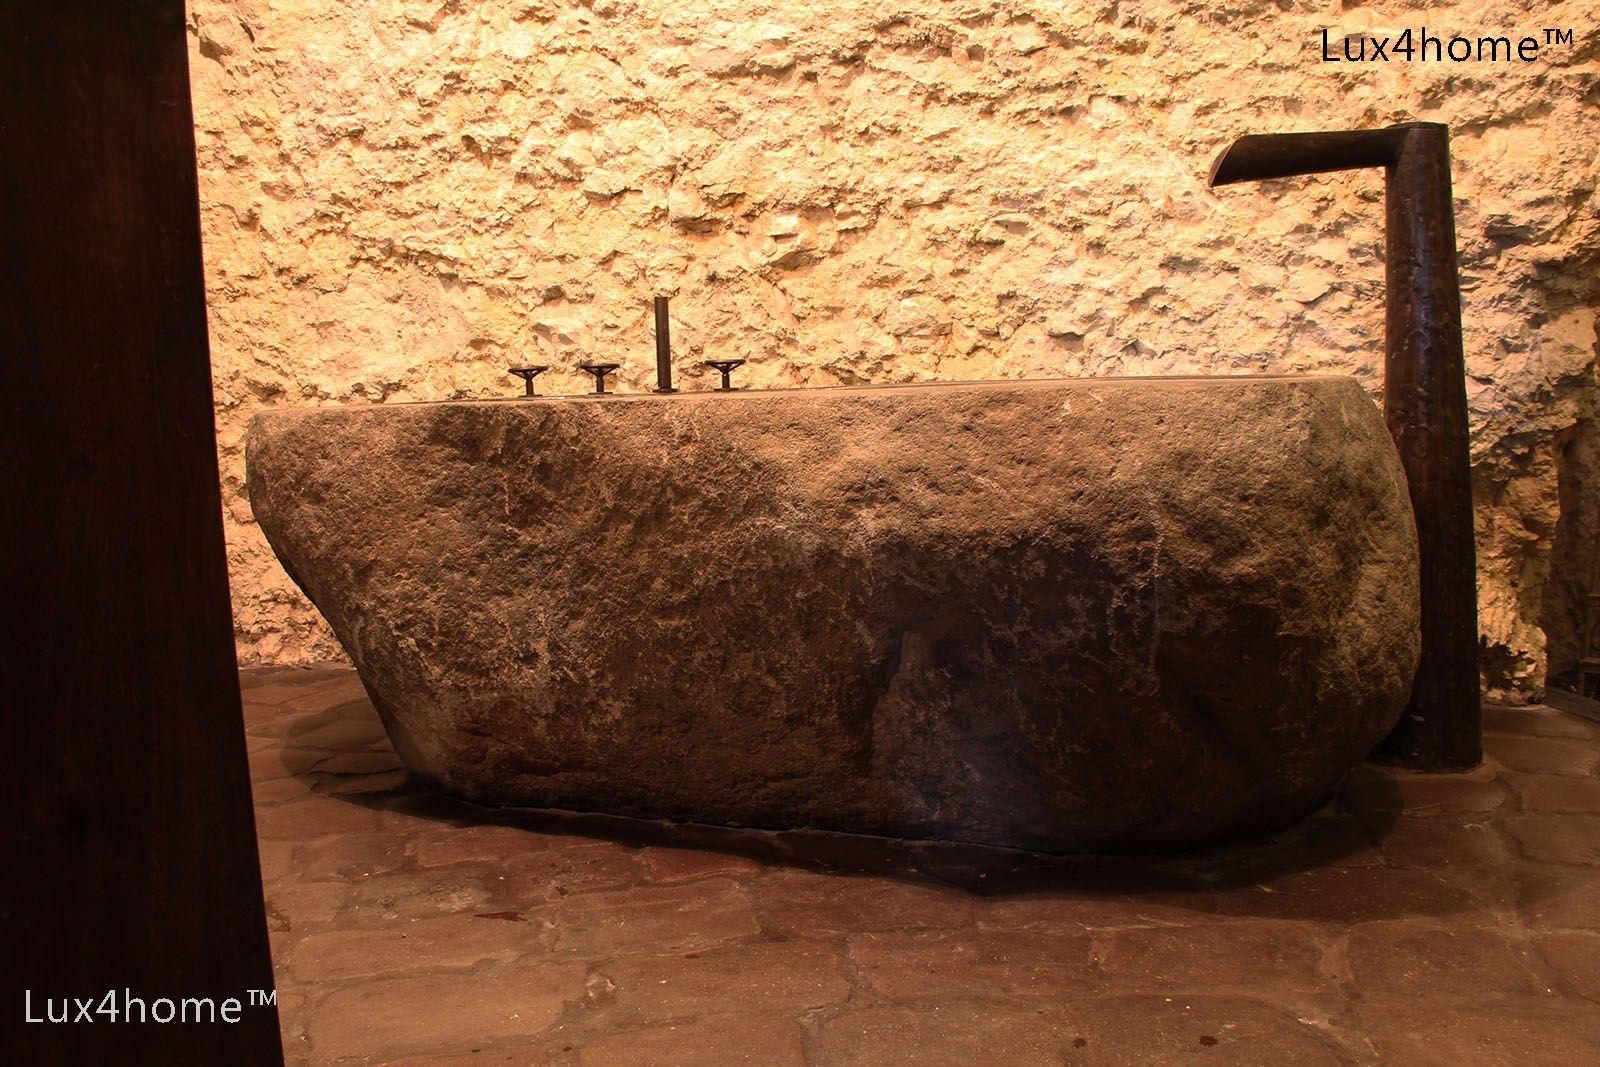 Stone Tubs For Sale Stone Bathtub Stone Tub Bathtubs For Sale